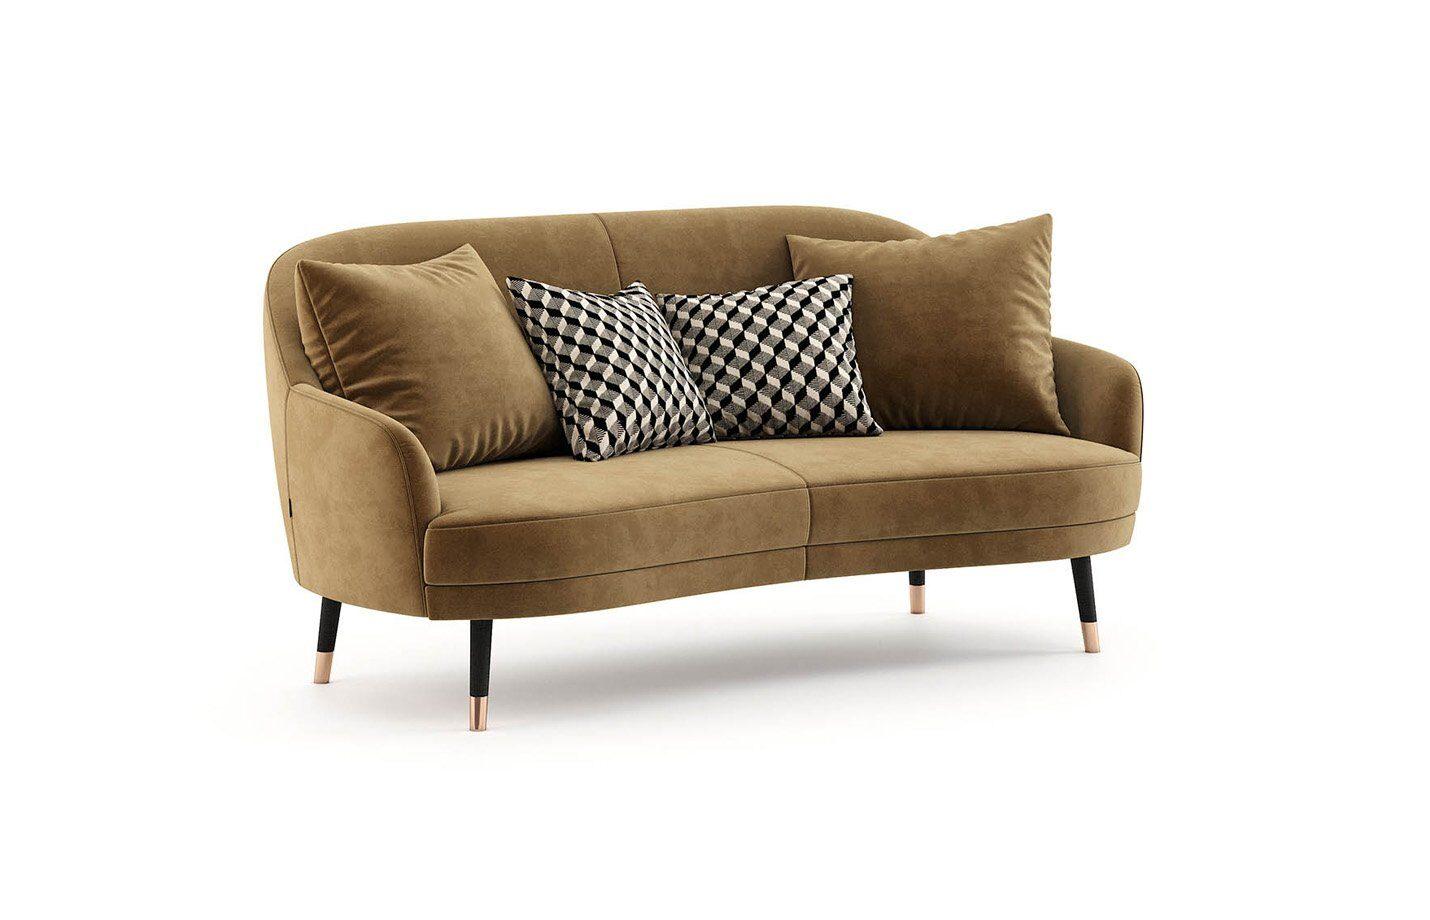 Atlantis-Sofa-Furniture-collection-by-fabiia-01